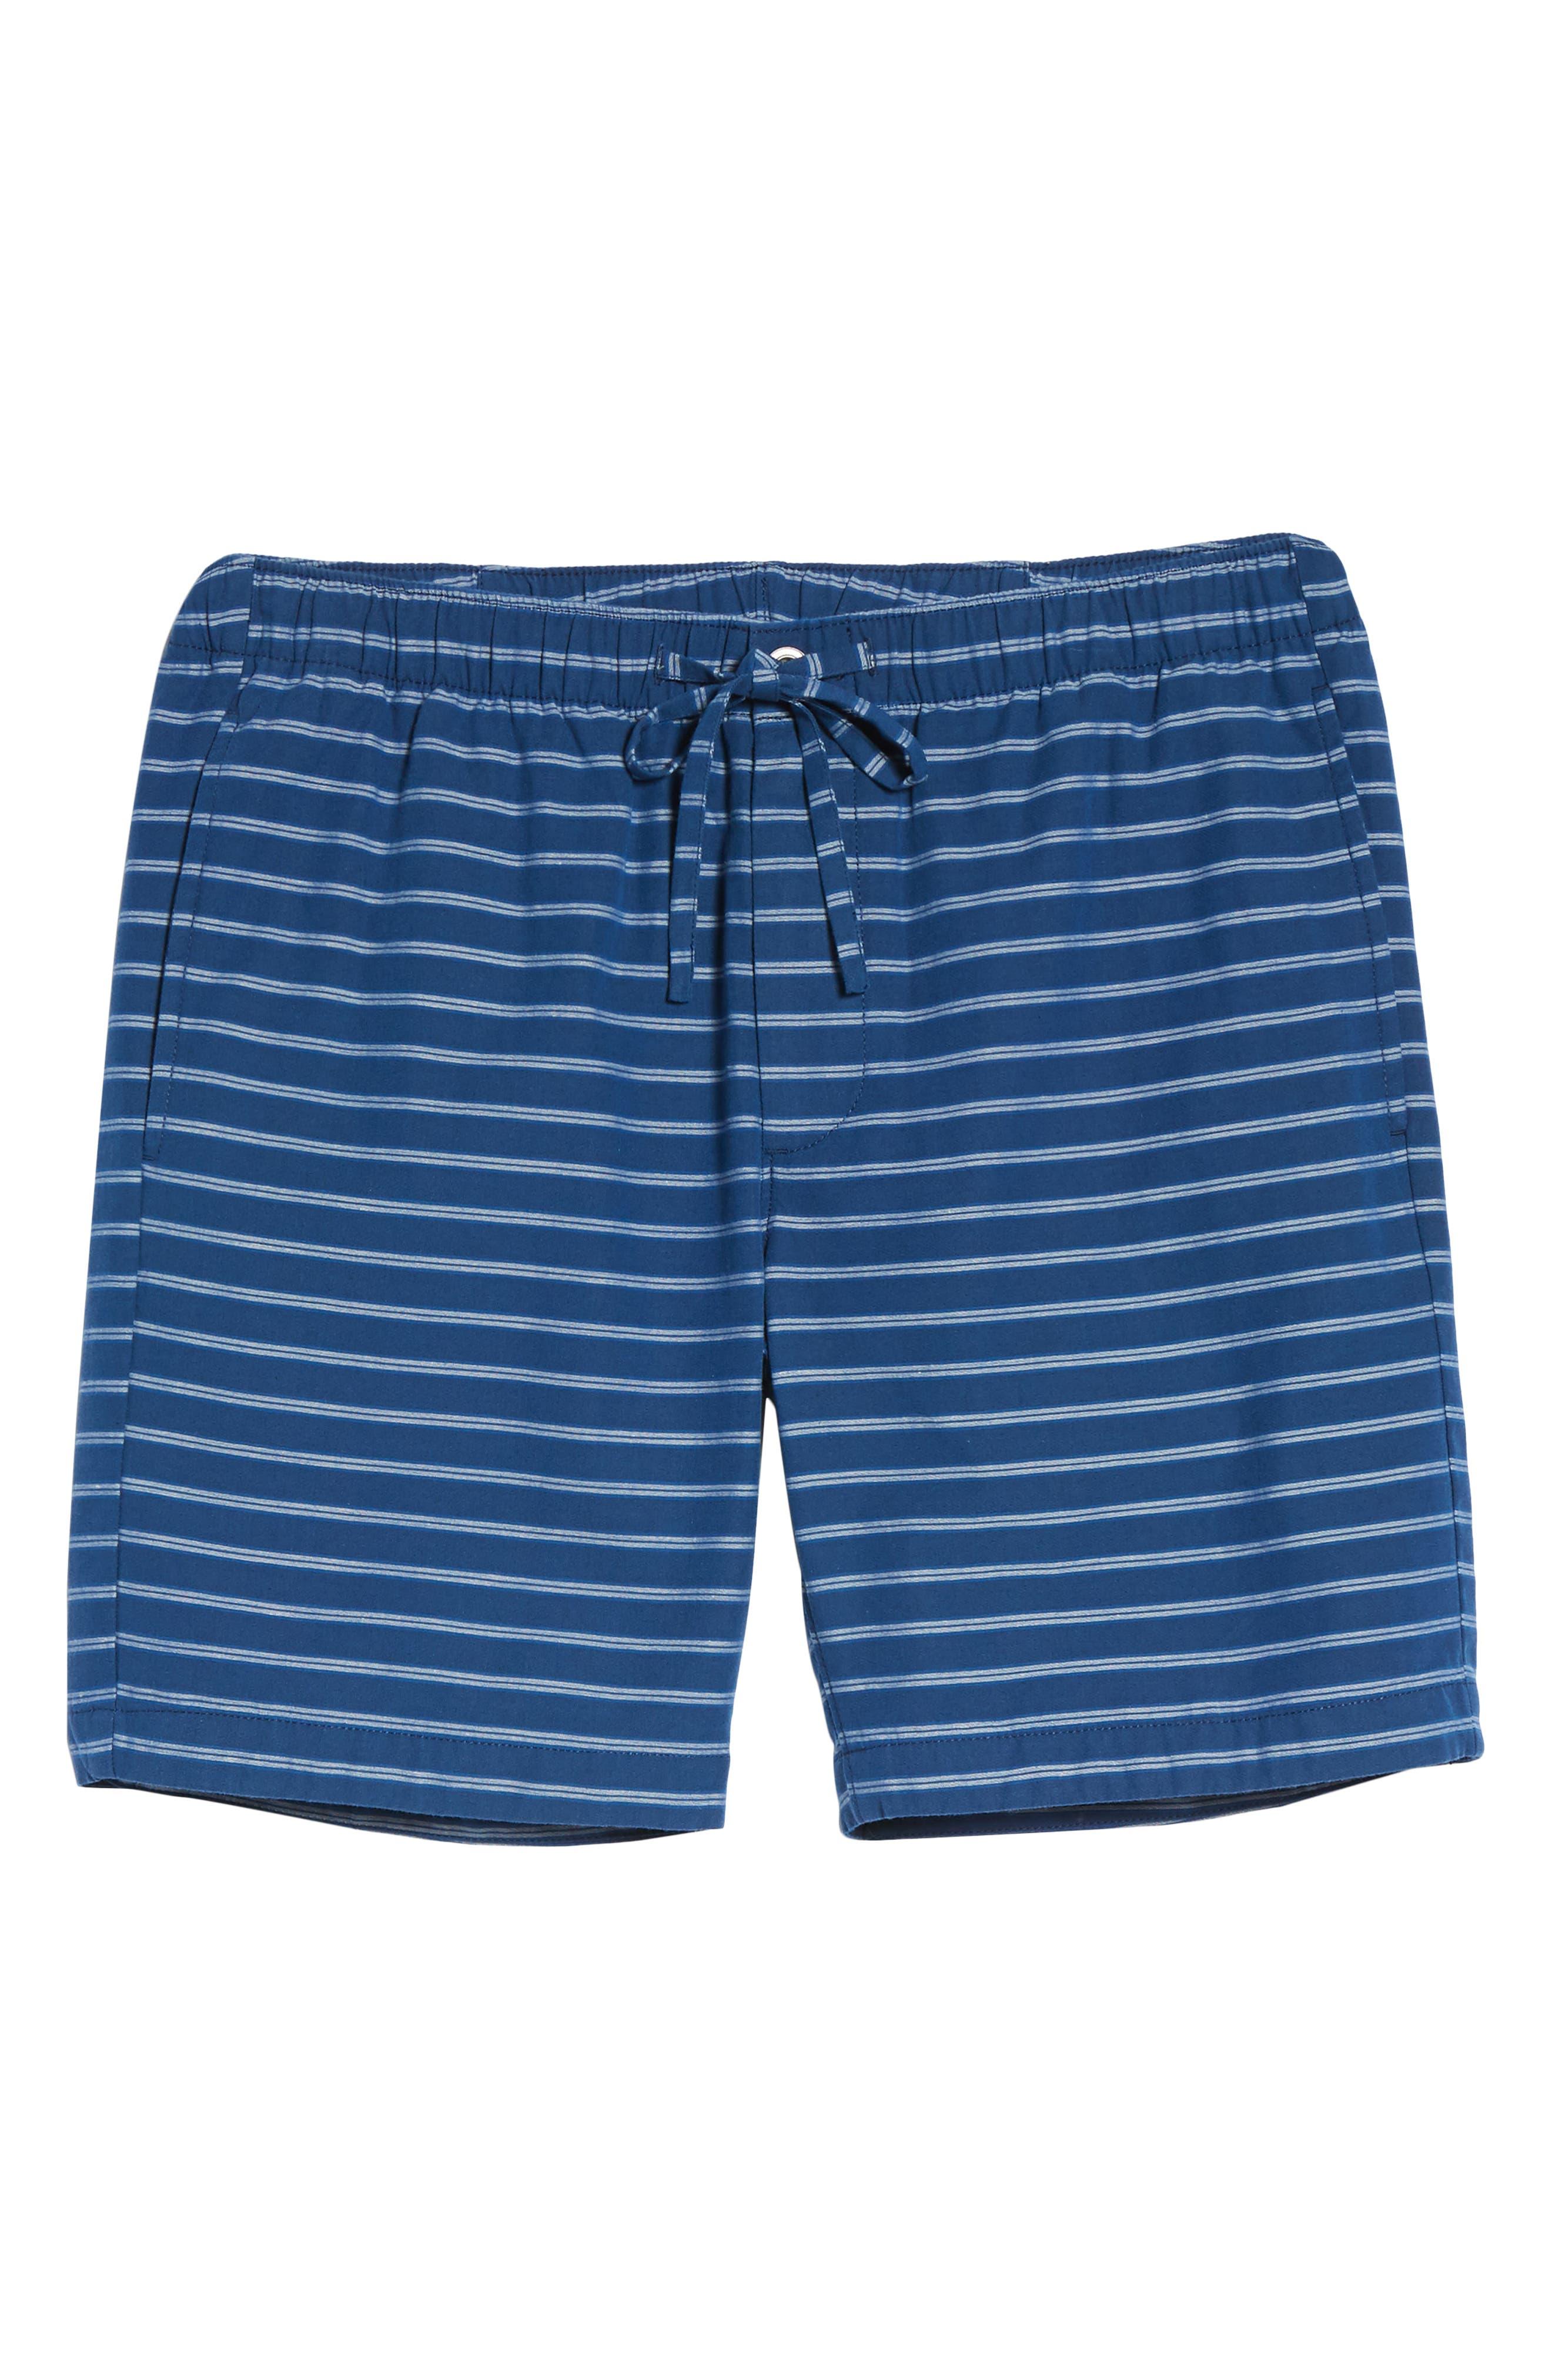 Slim Fit Stripe Beach Shorts,                             Alternate thumbnail 6, color,                             Blue Stripe